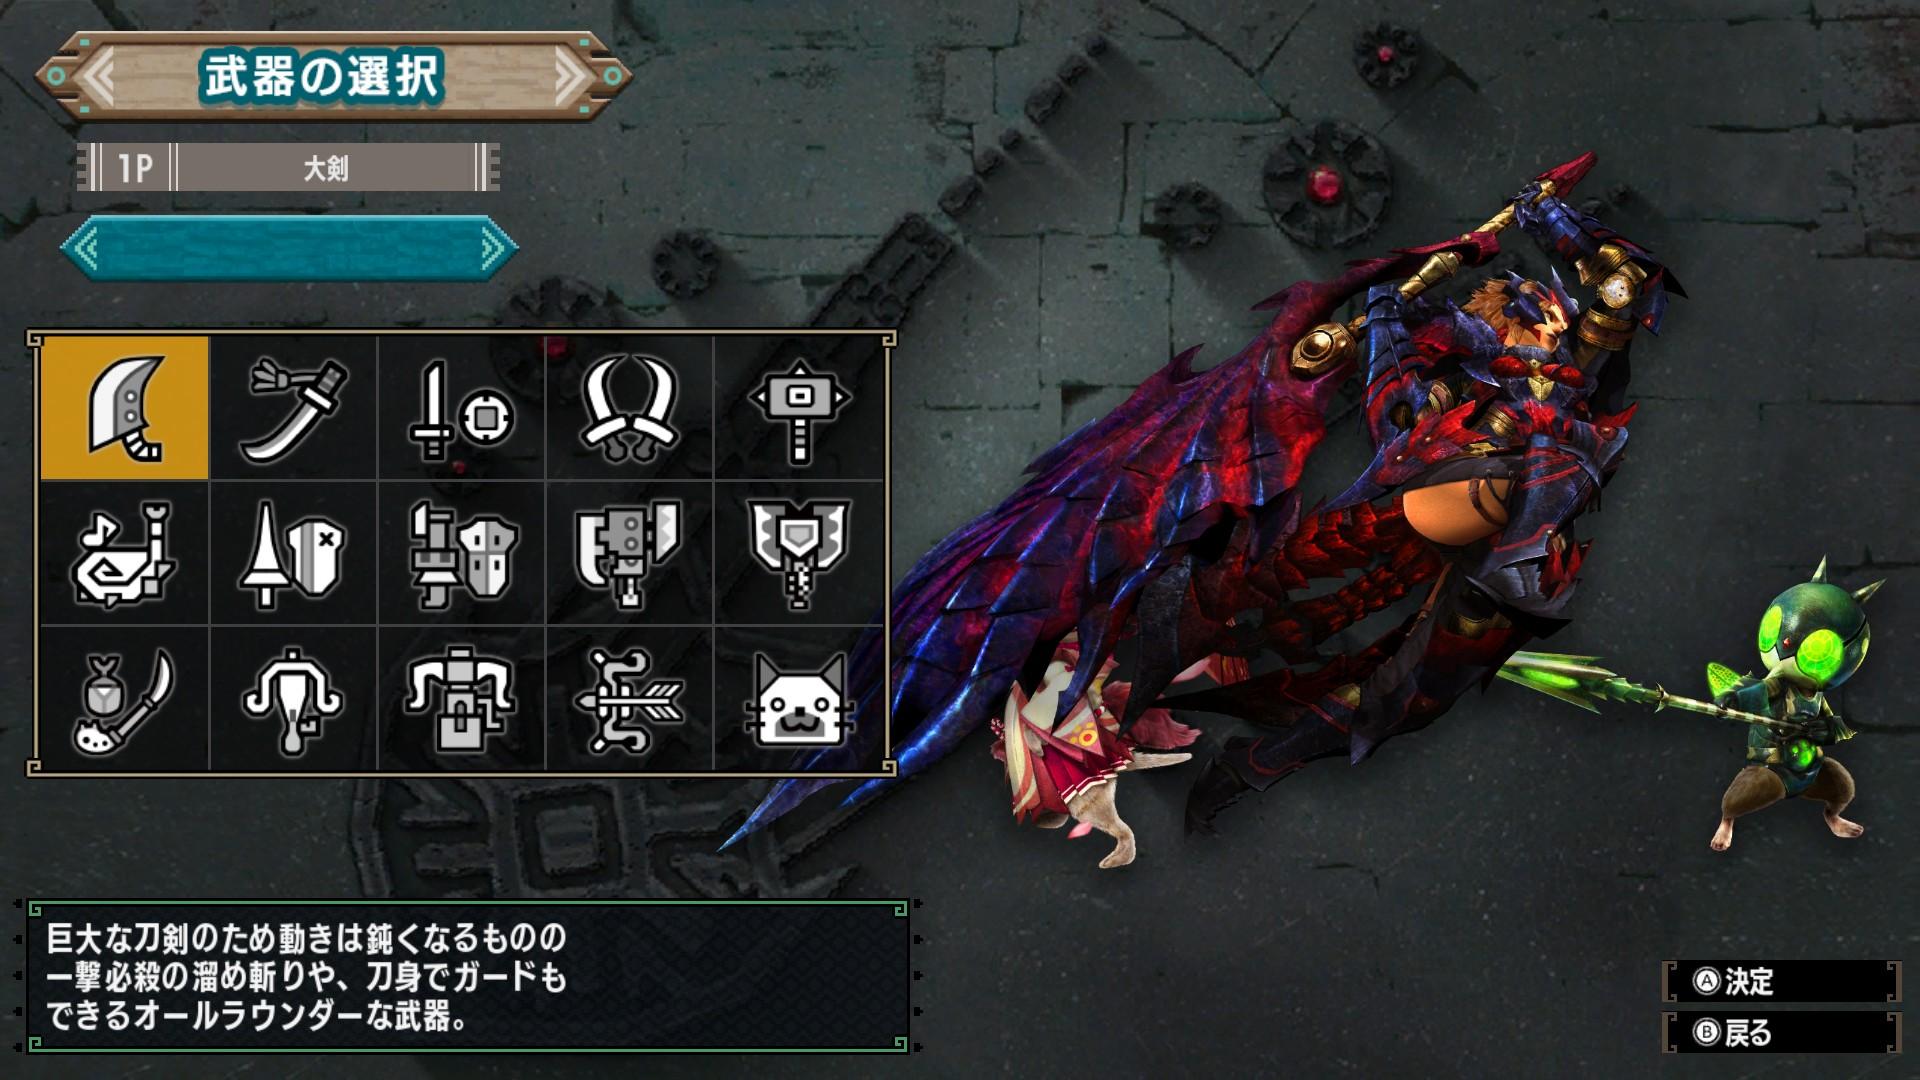 Monster-Hunter-XX-Nintendo-Switch-Ver_2017_06-26-17_003